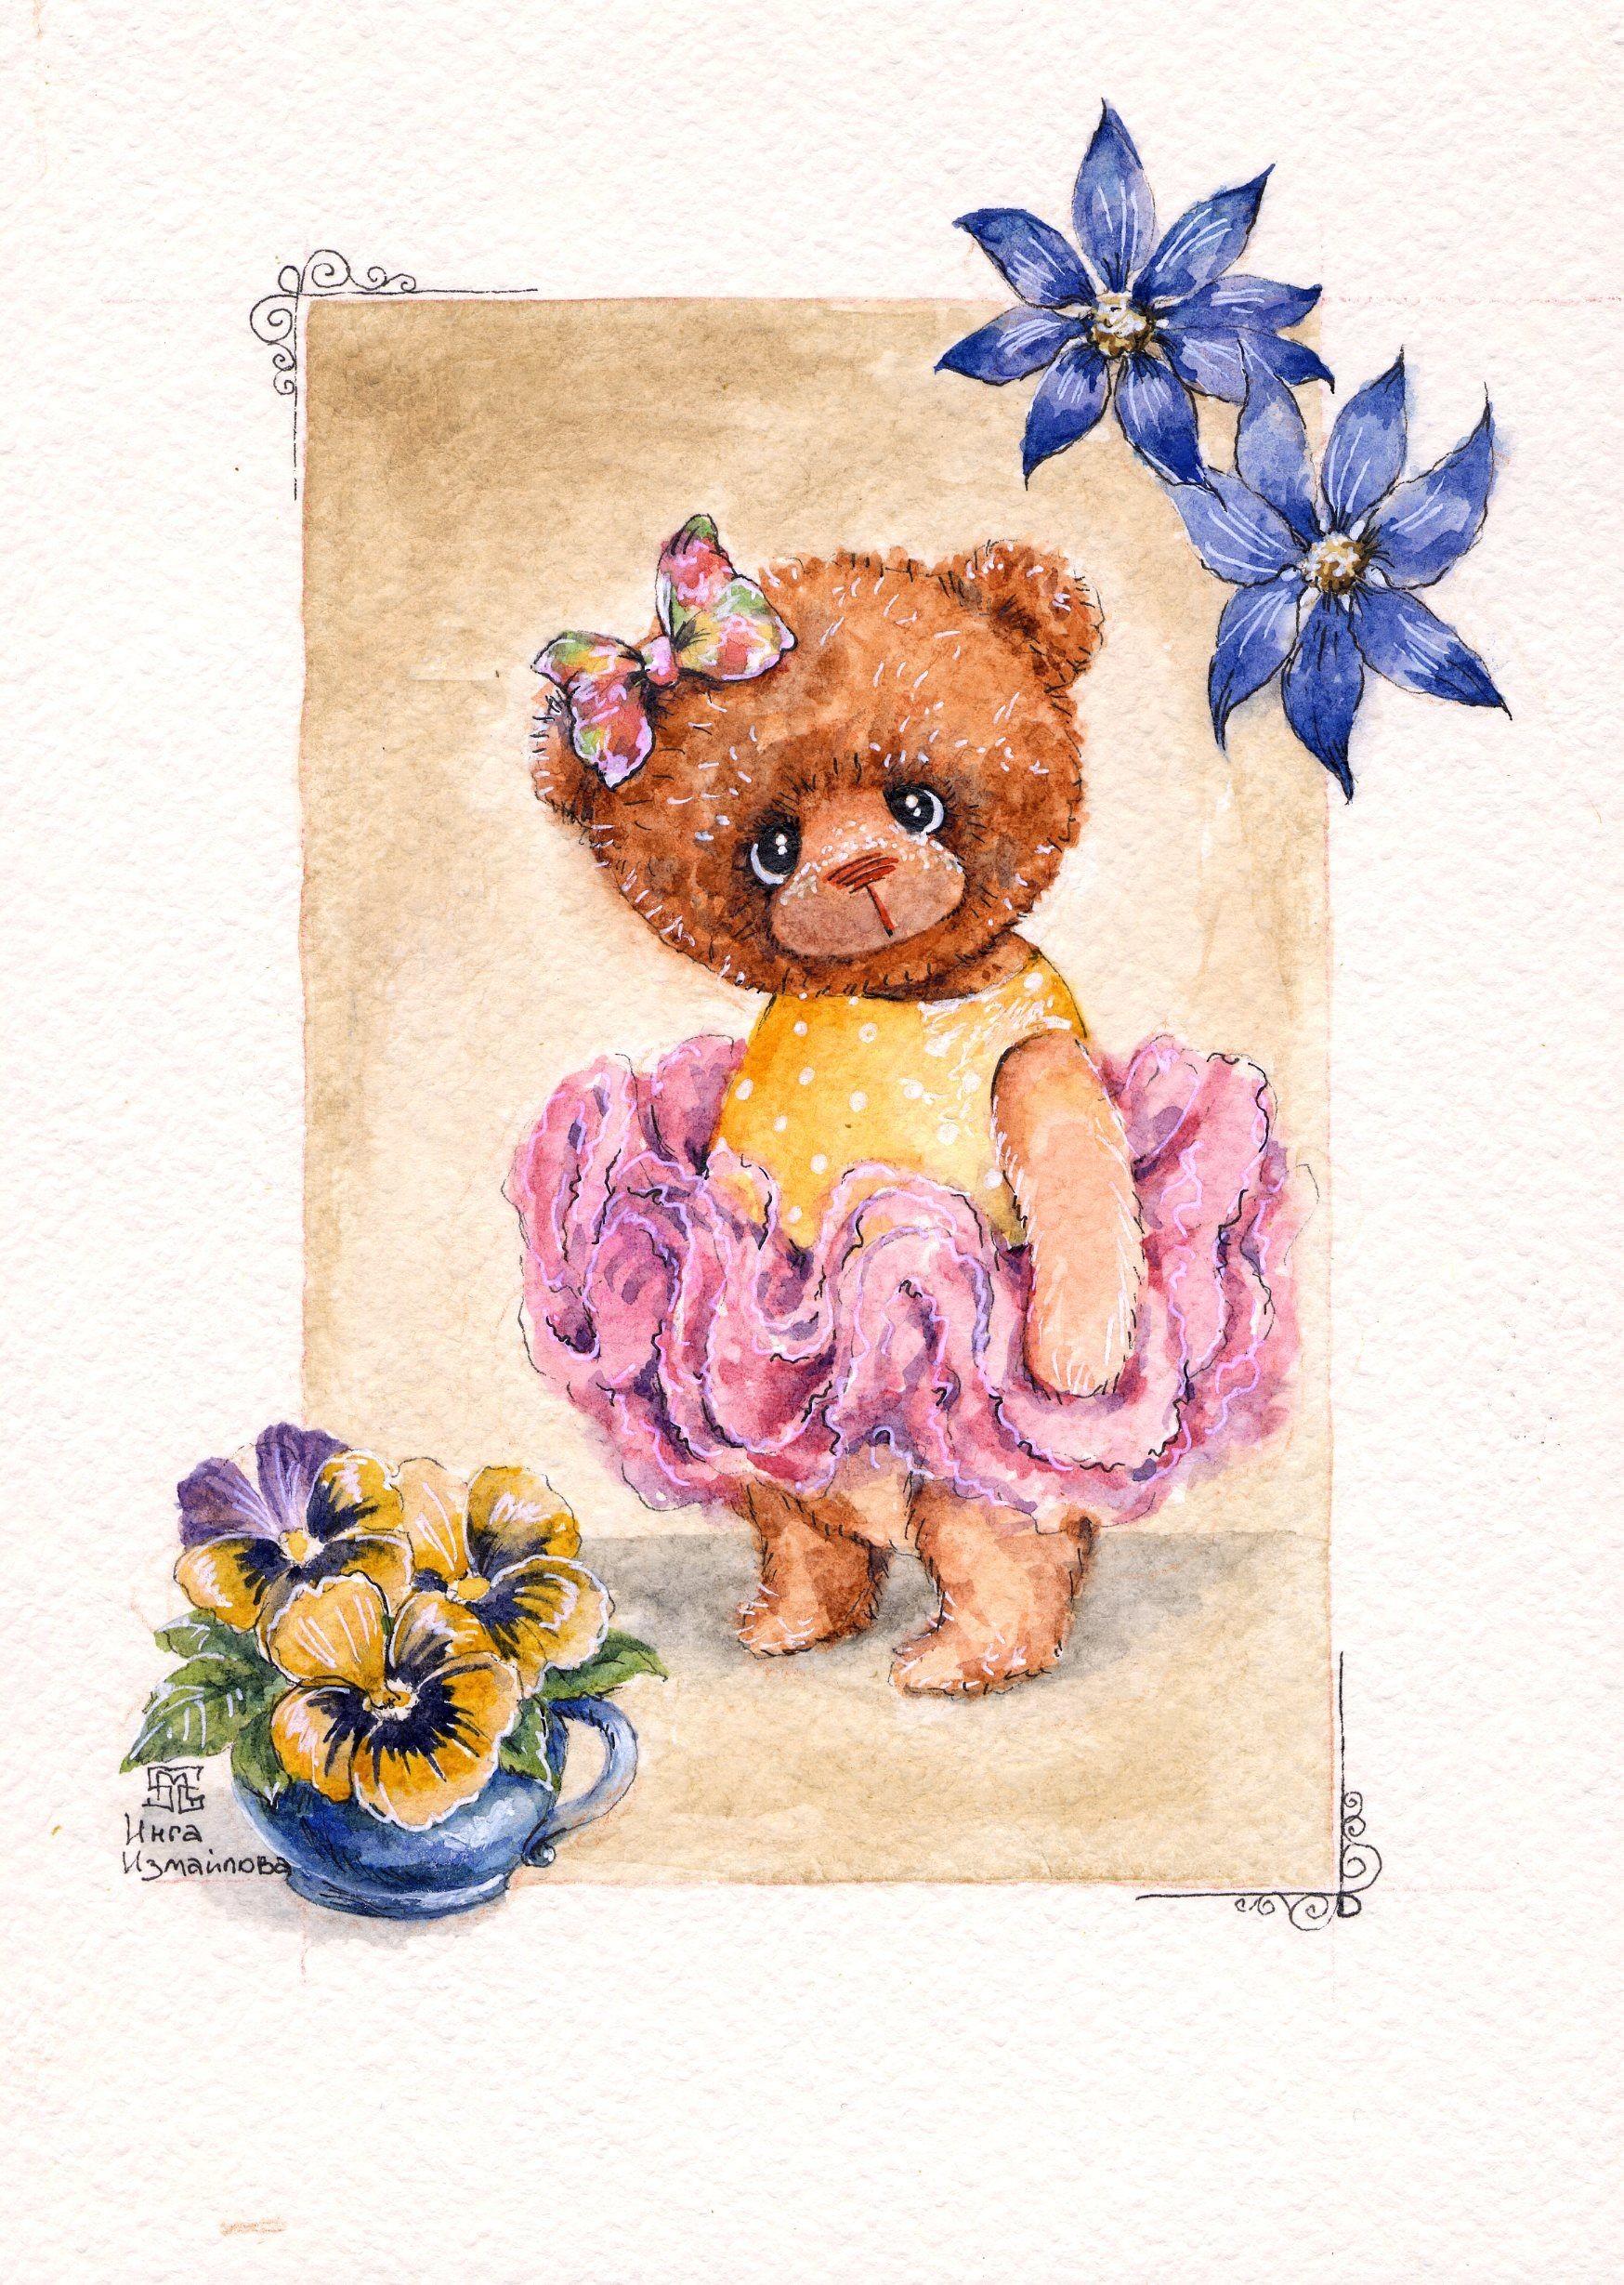 Teddy Bear Papercraft по мотивам работ НеРРи СвитеРьской Bears Dolls toys Watercolor